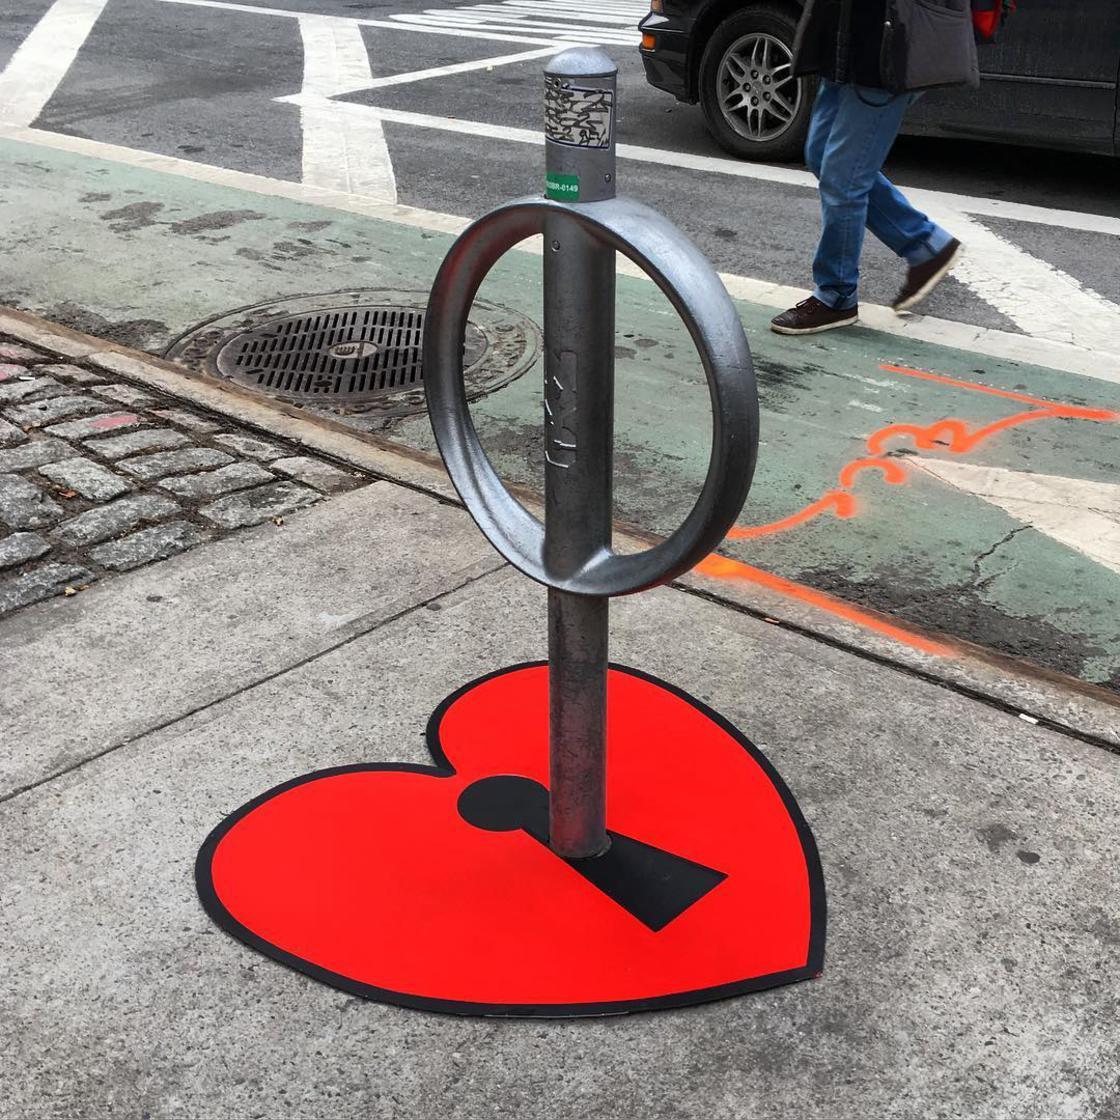 tom-bob-street-art-new-york-11.jpg